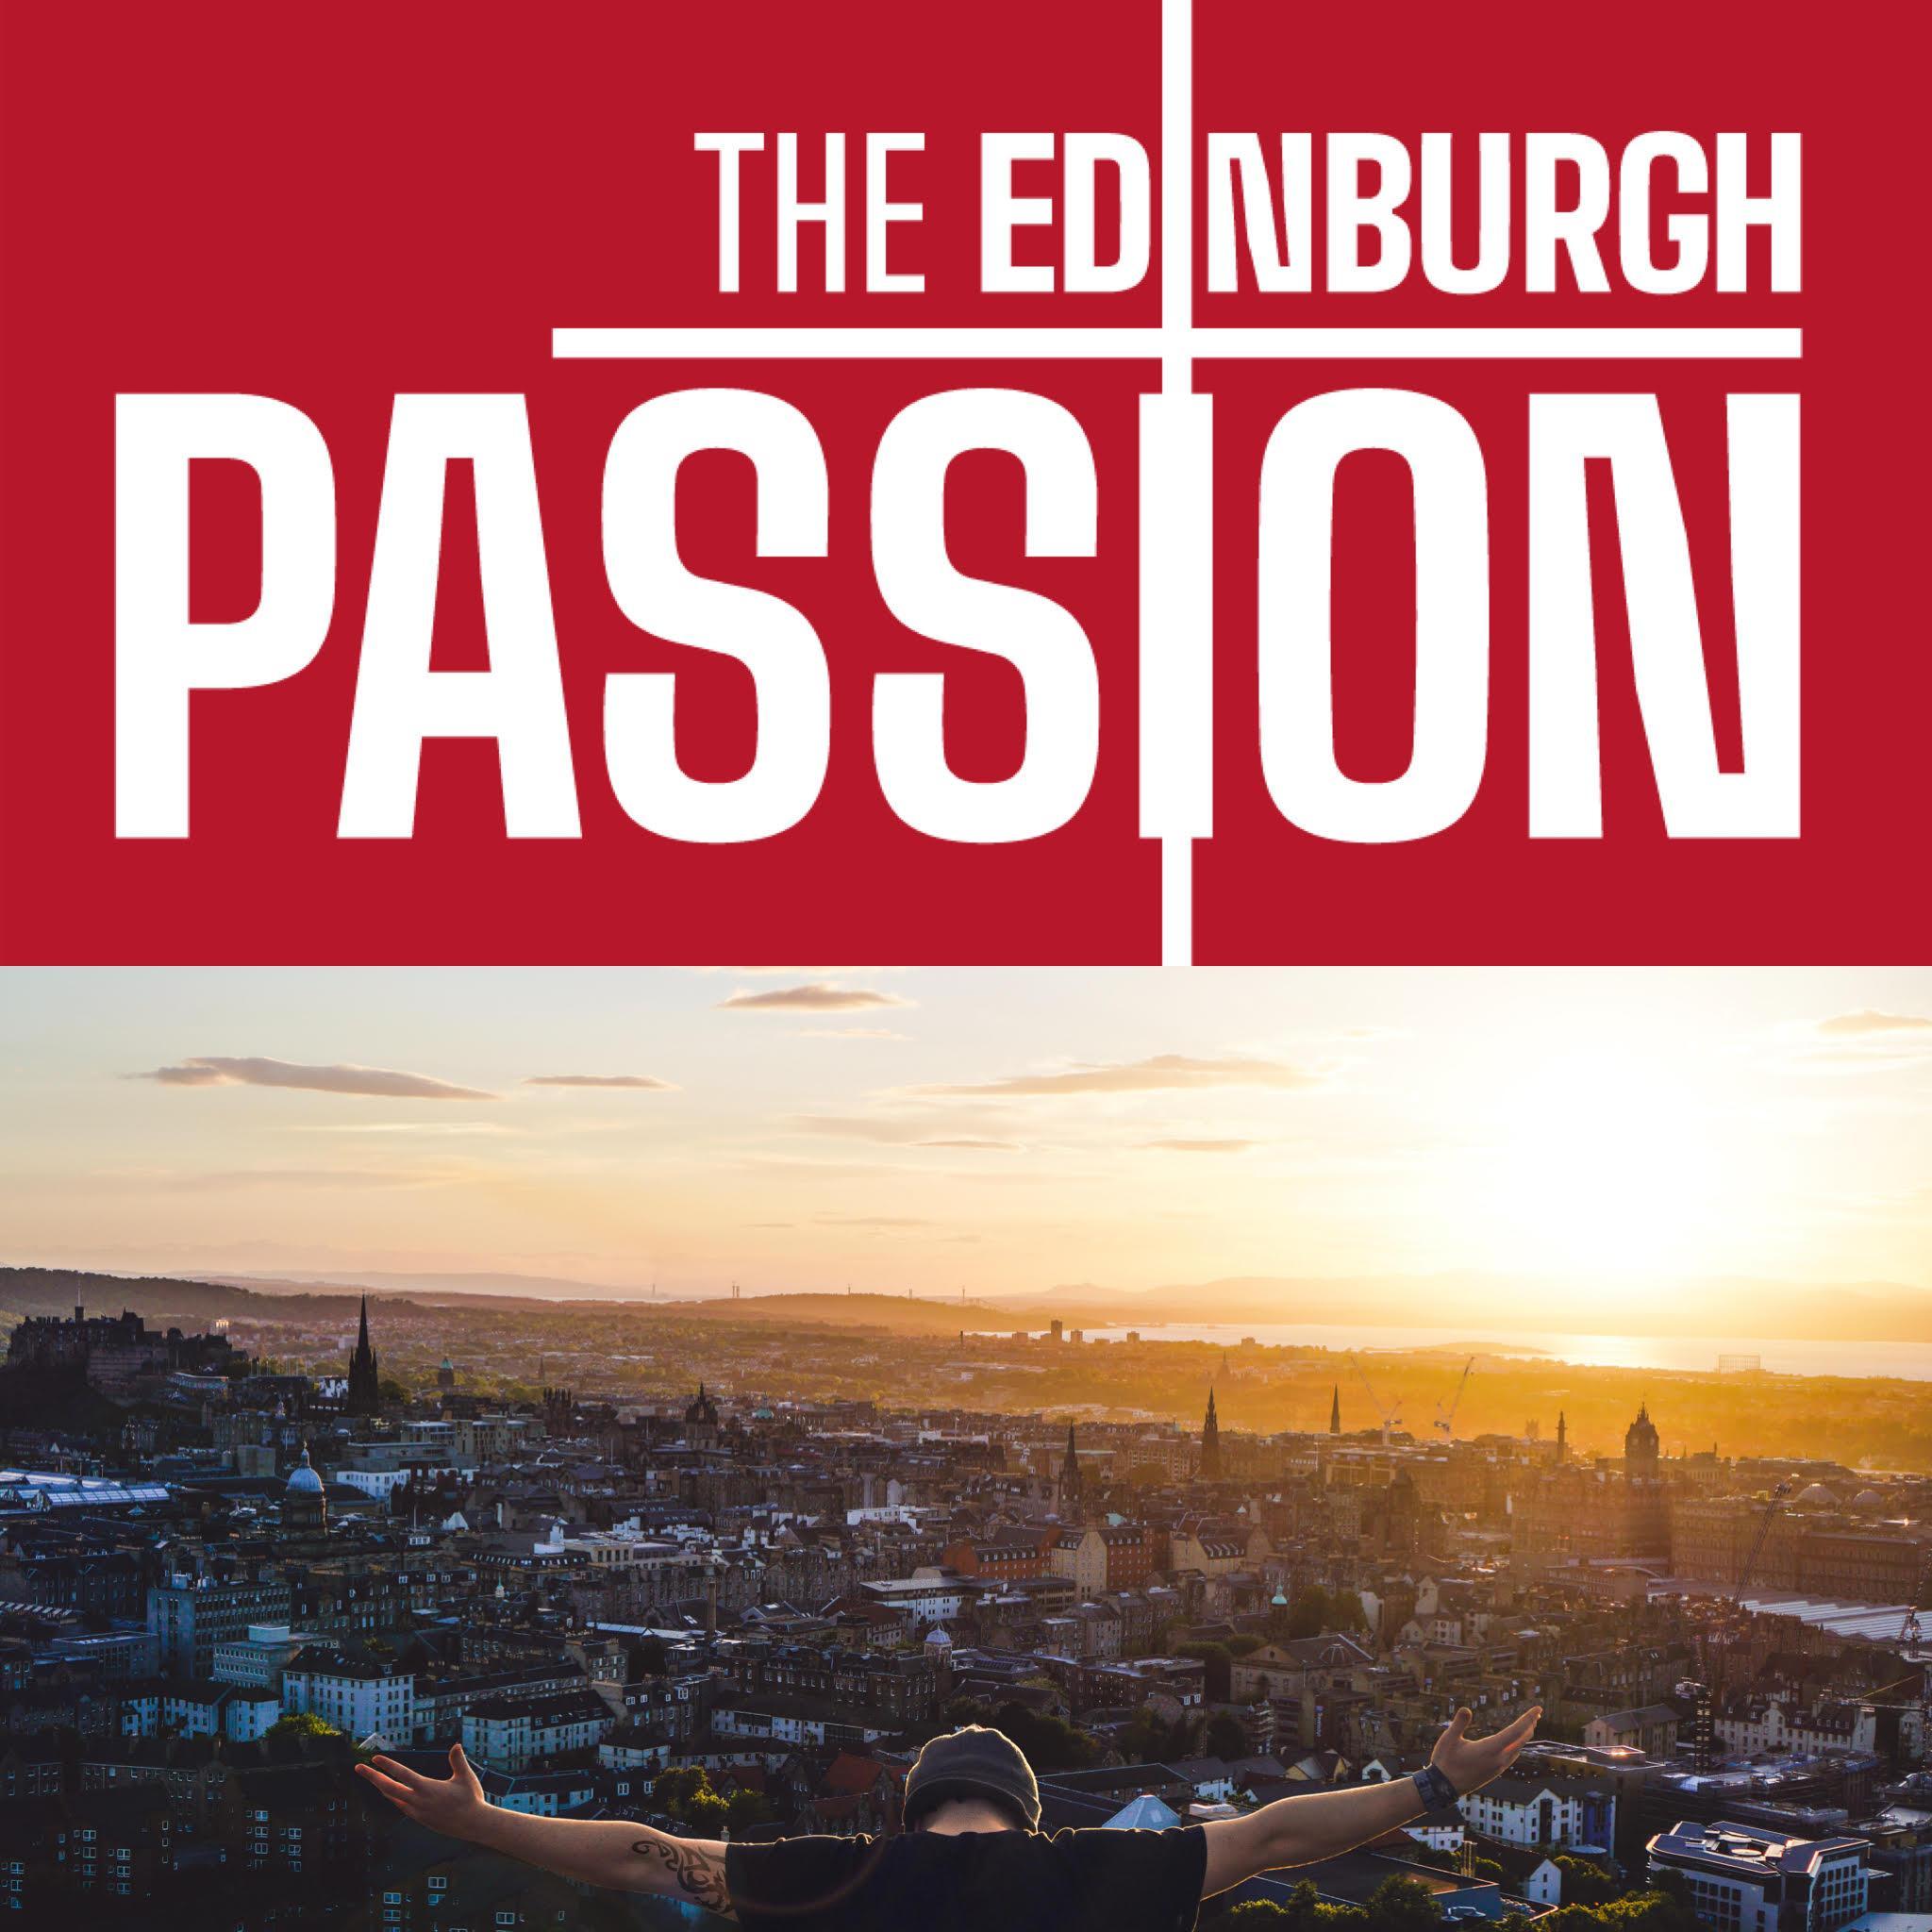 Edinburgh Passion Last Supper - Dine Restaurant